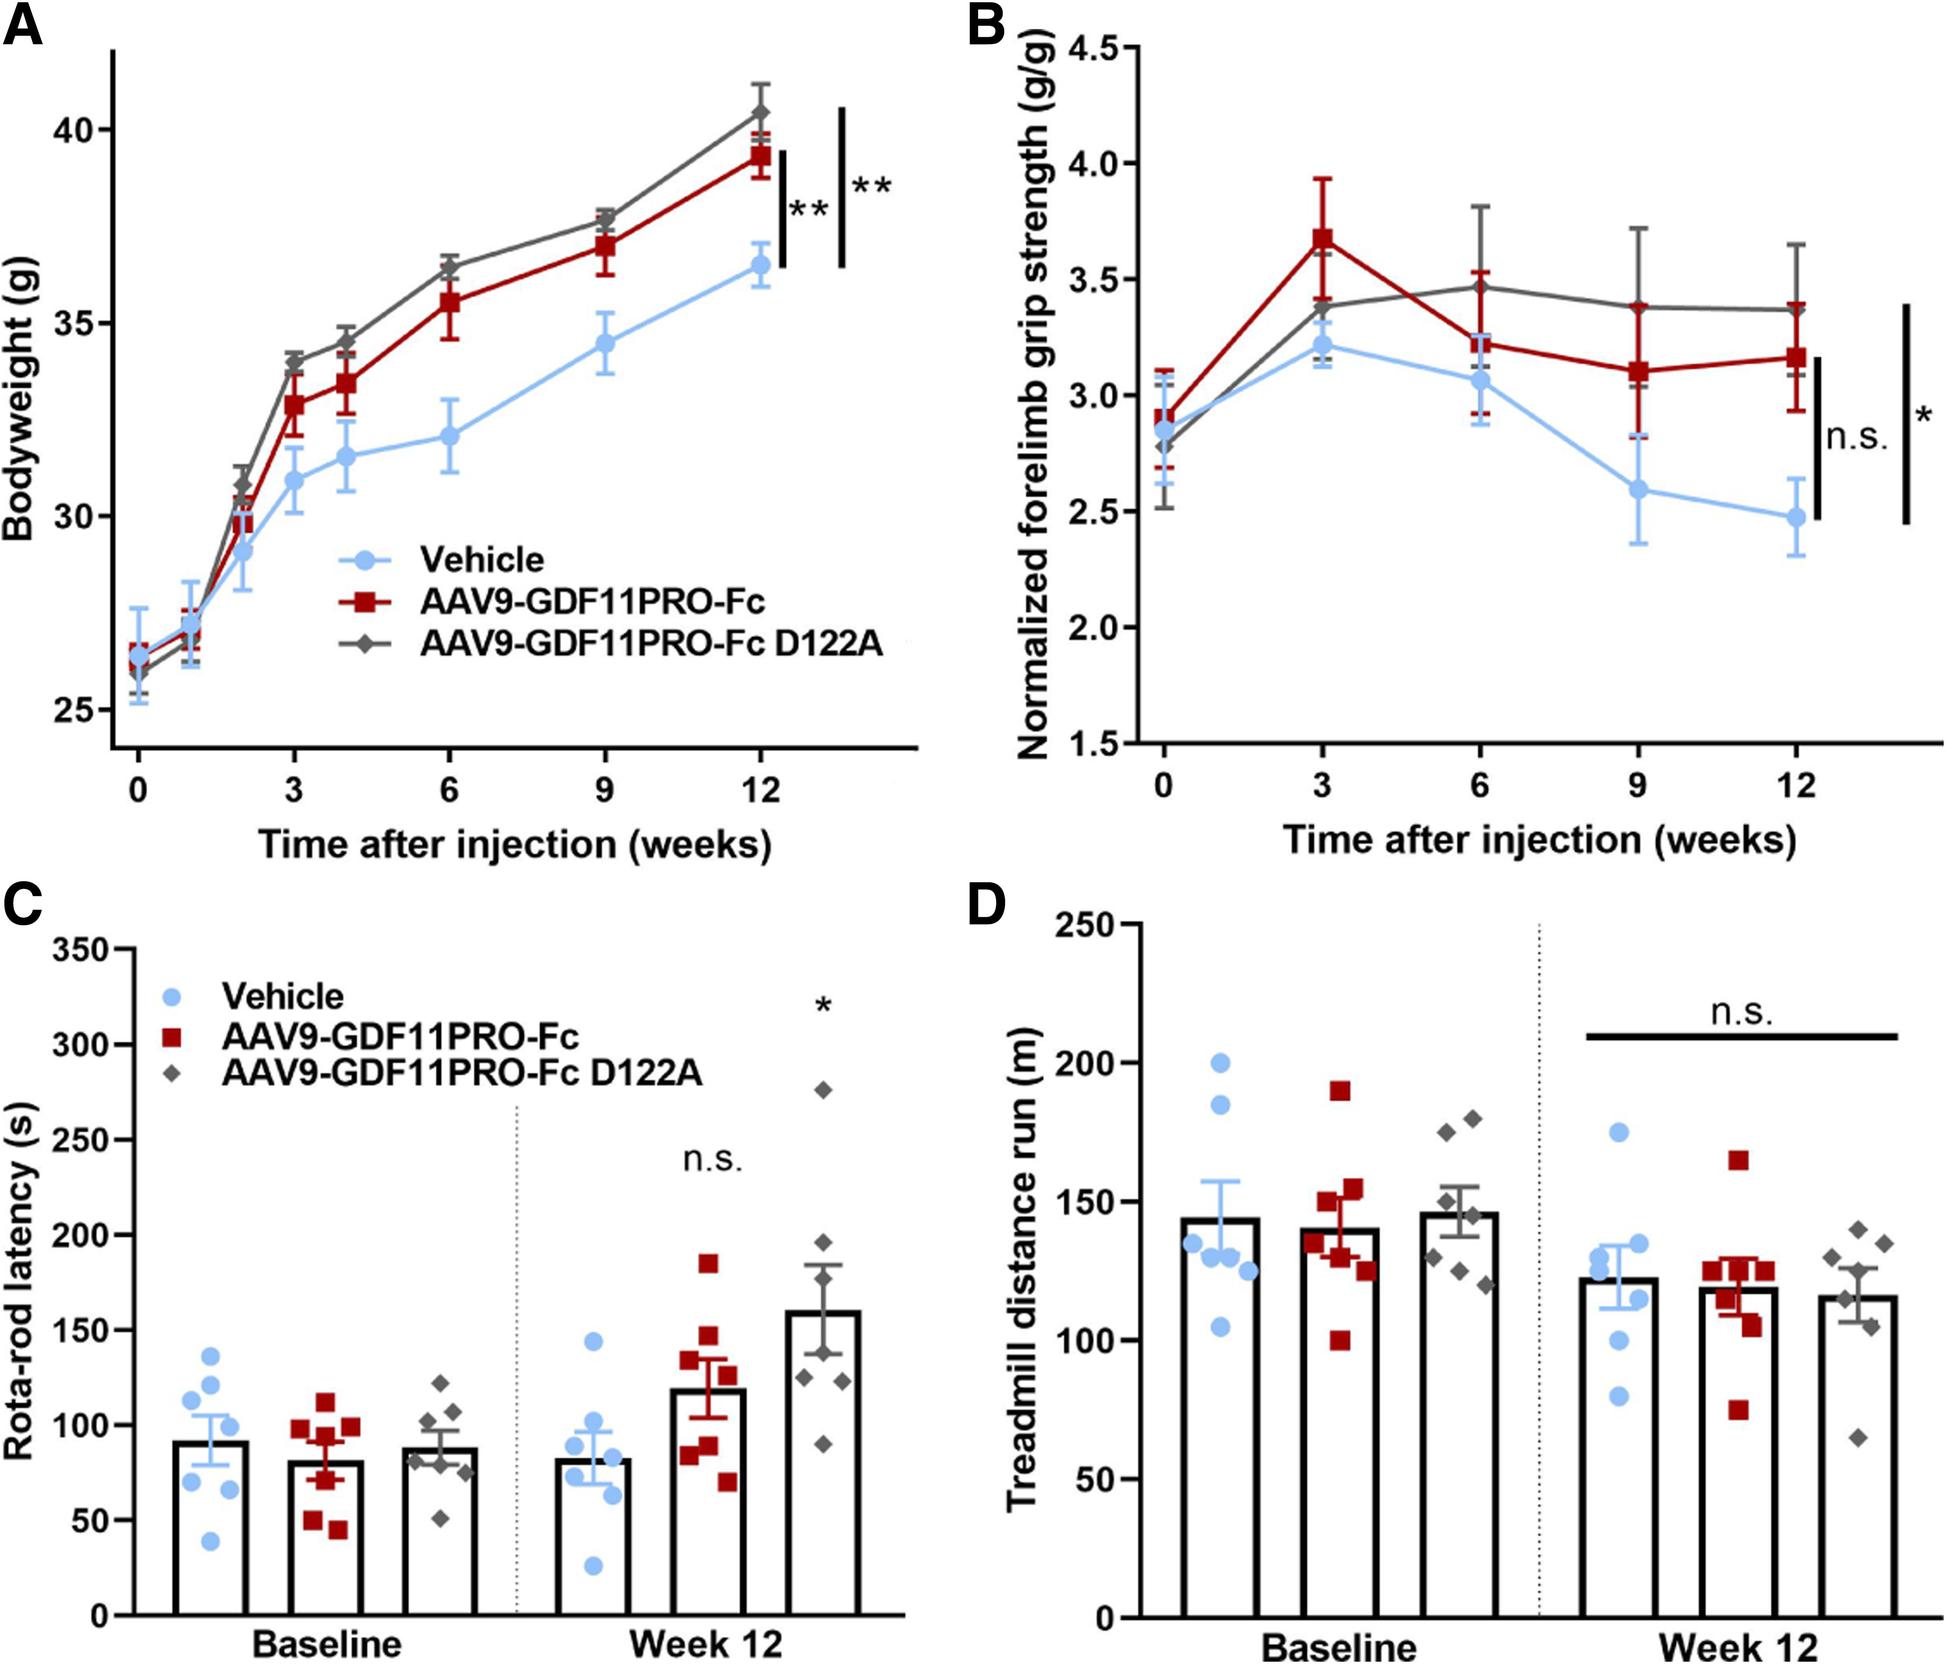 A GDF11/myostatin inhibitor, GDF11 propeptide-Fc, increases skeletal